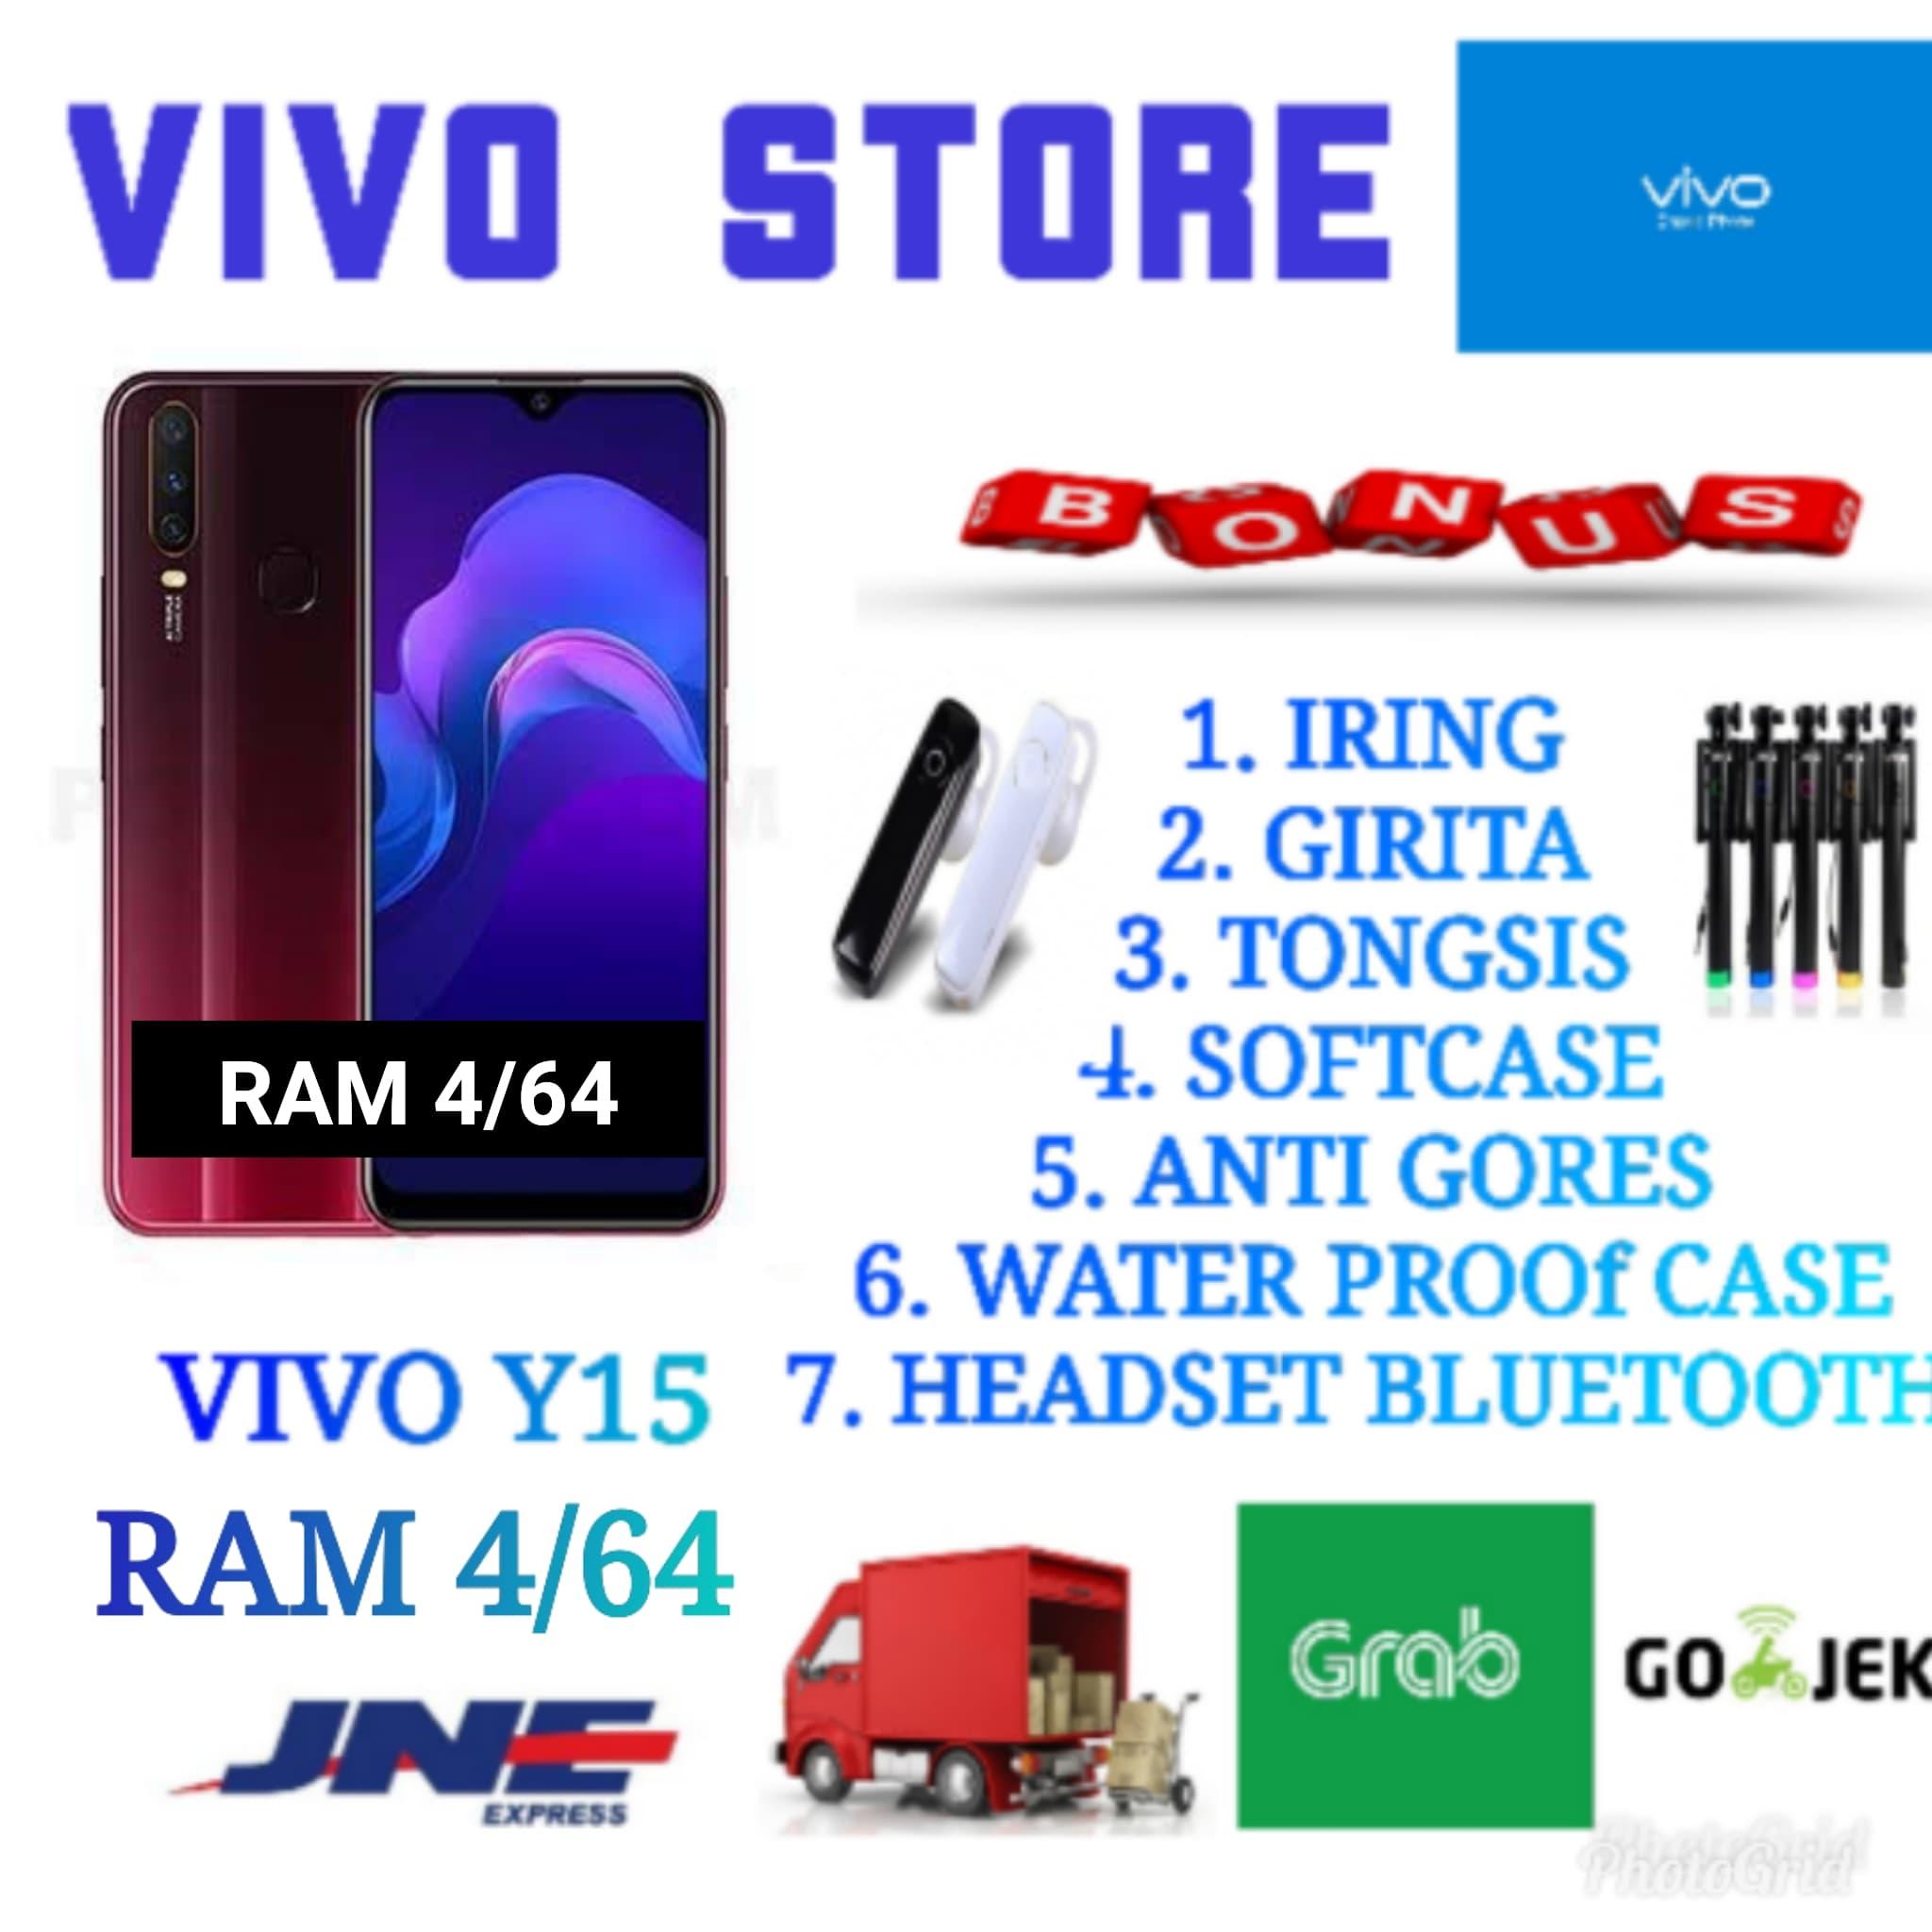 Jual VIVO Y15 RAM 4/64 GARANSI RESMI VIVO INDONESIA